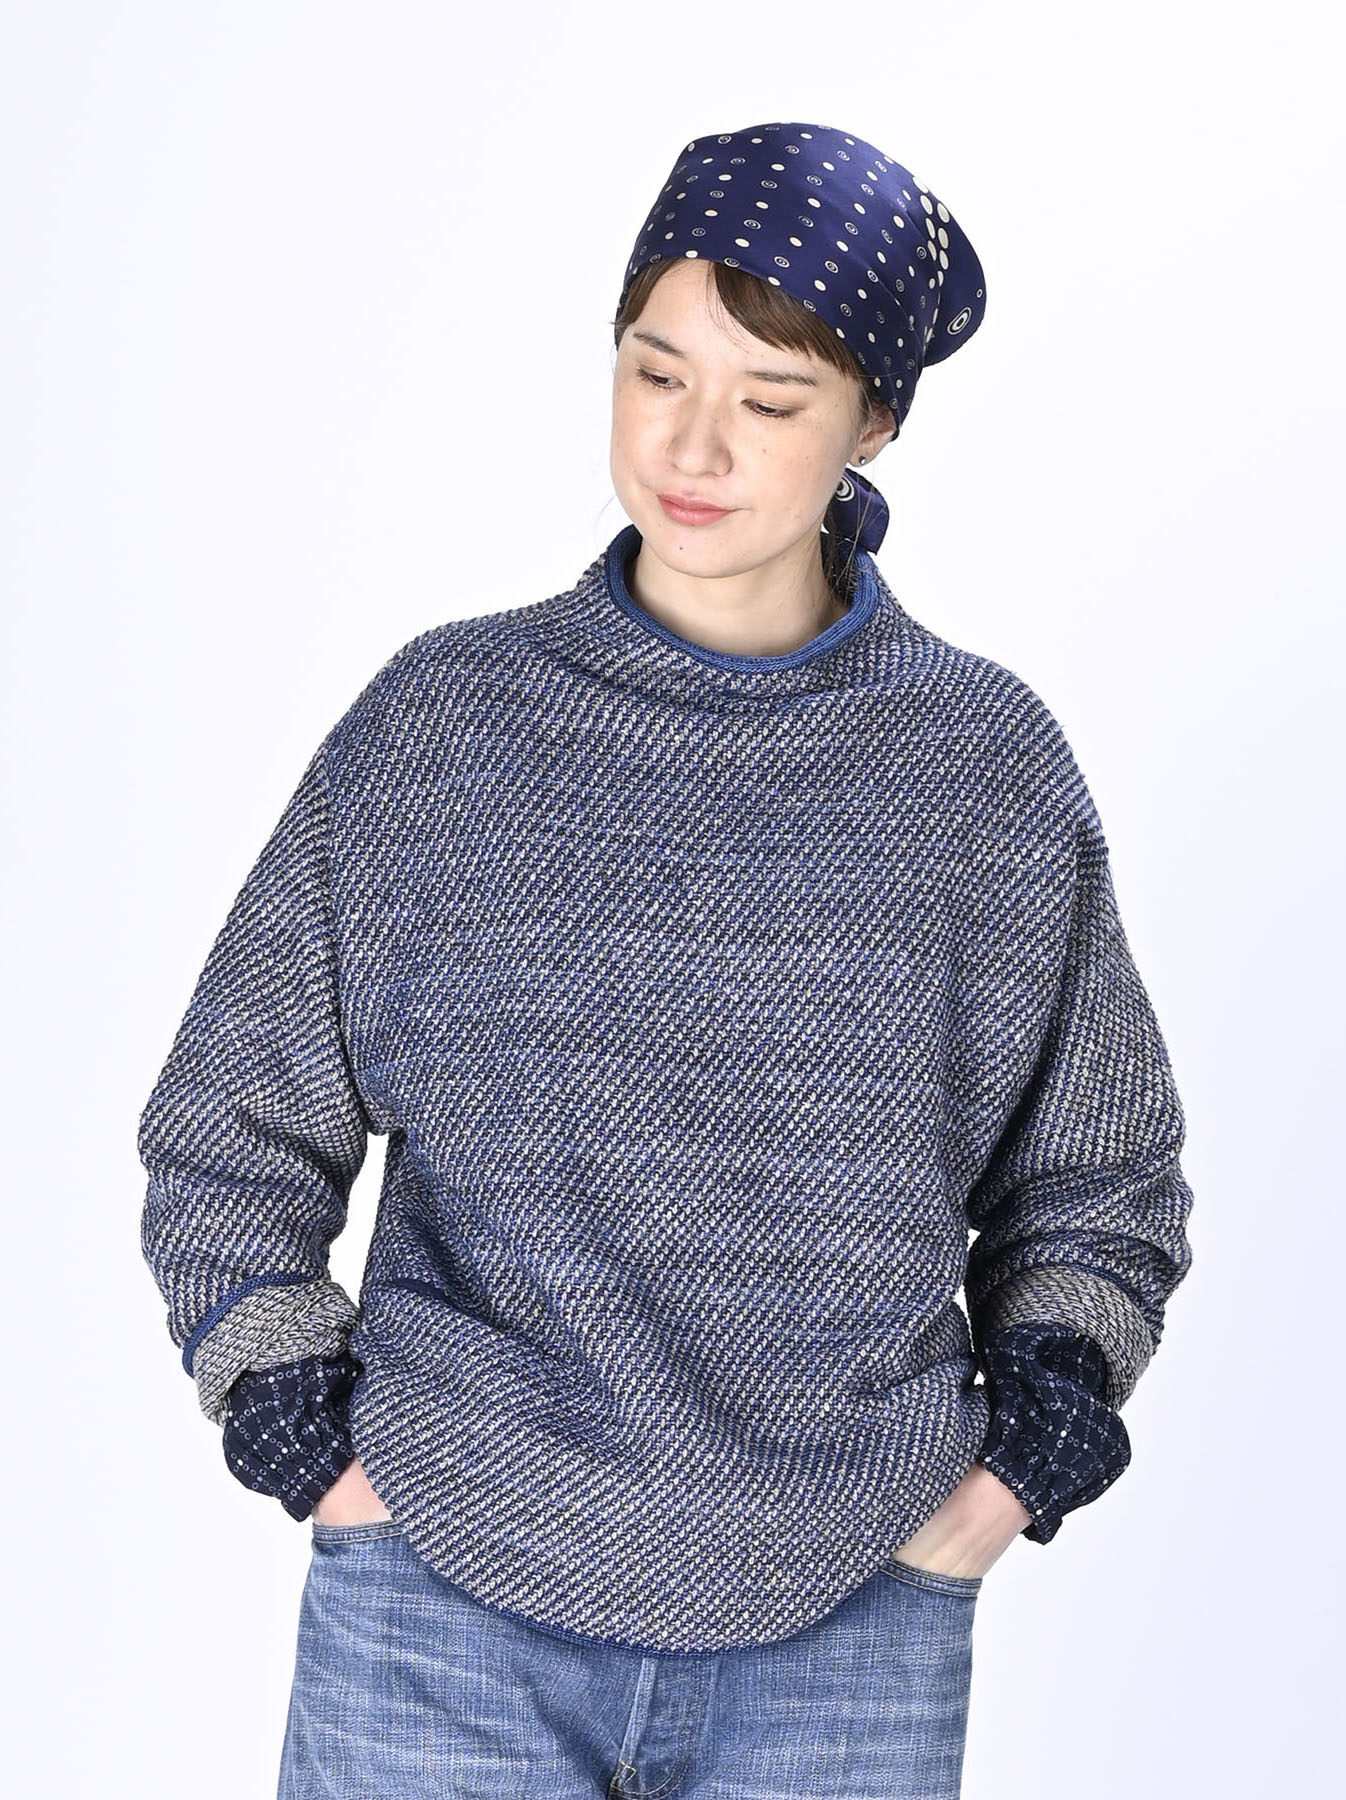 Indigo Knit Jacquard 908 Umahiko Sweater-3